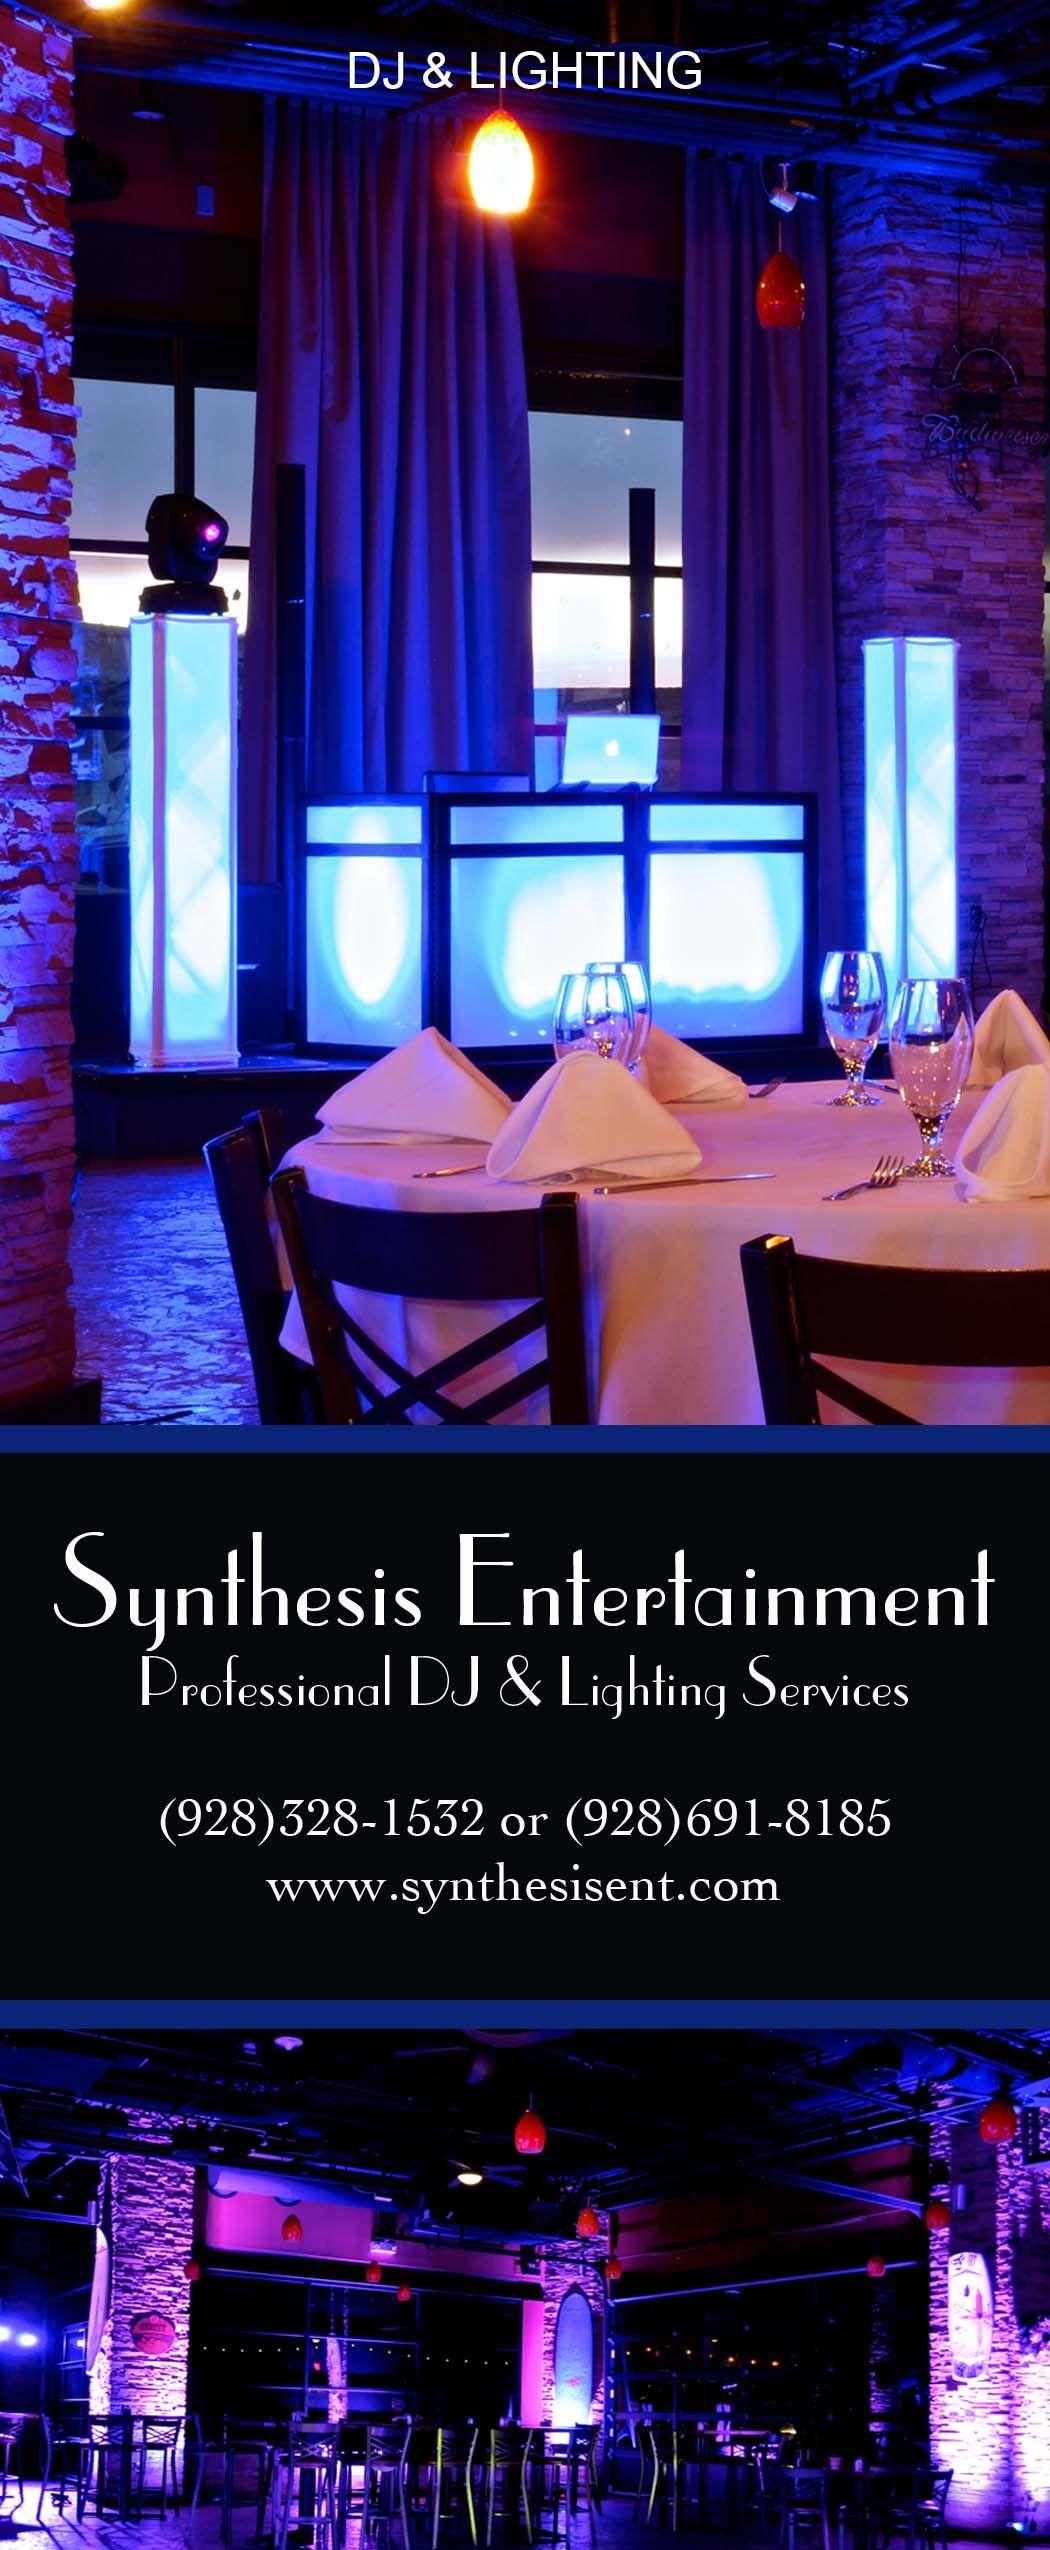 Dj Uplighting Flagstaff Weddings Synthesis Entertainment Brochure Www Synthesisent Com Www Flagstaffweddingstudio Dj Lighting Wedding Dj Entertaining